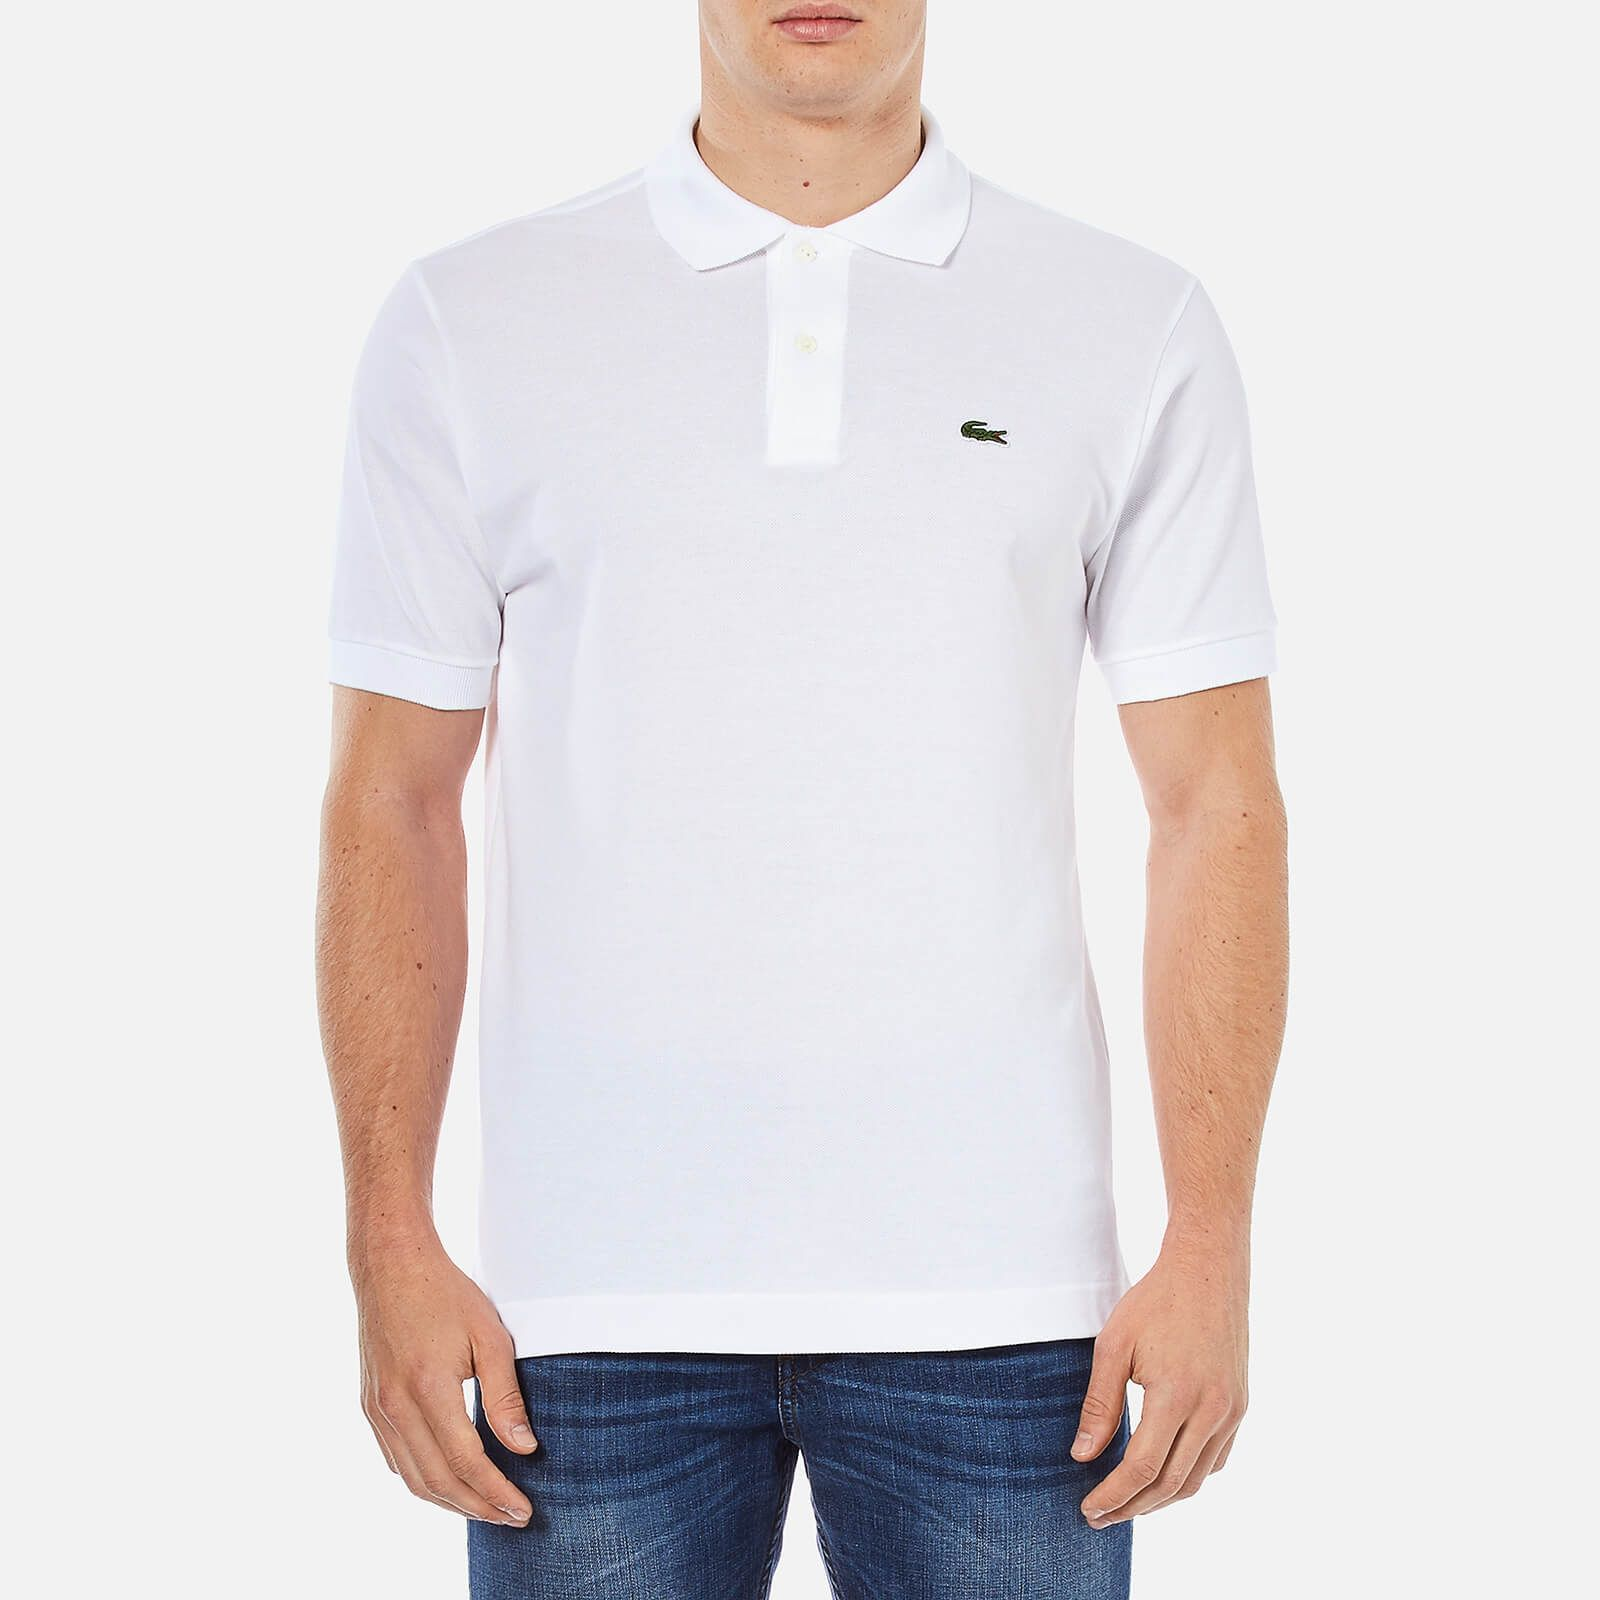 Lacoste Men   Polo shirt white, Lacoste men, Polo shirt brands